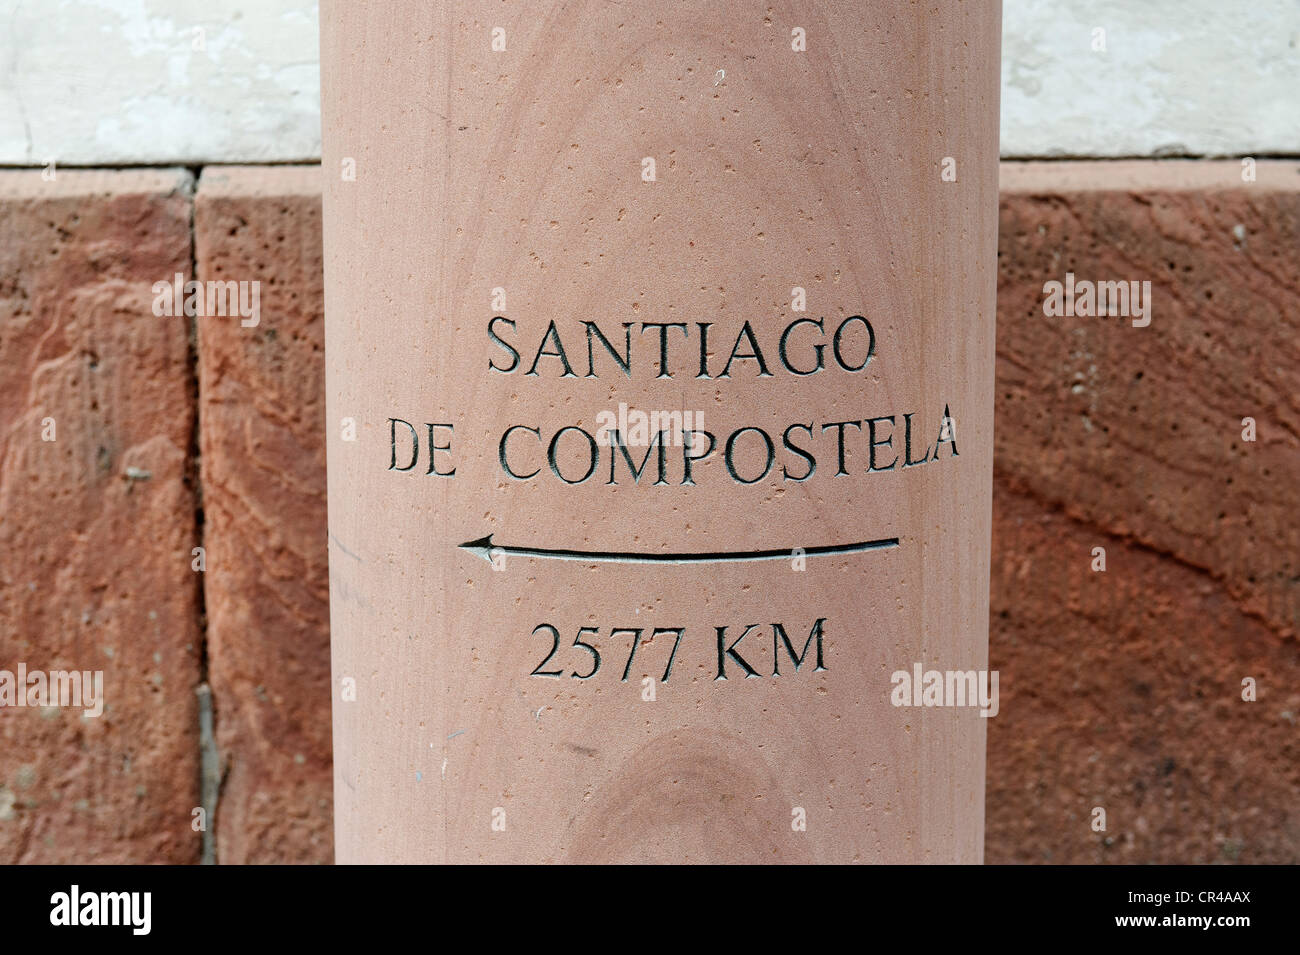 Column with lettering for the Camino de Santiago, Way of St. James, pilgrimage road to Santiago de Compostela, Miltenberg - Stock Image